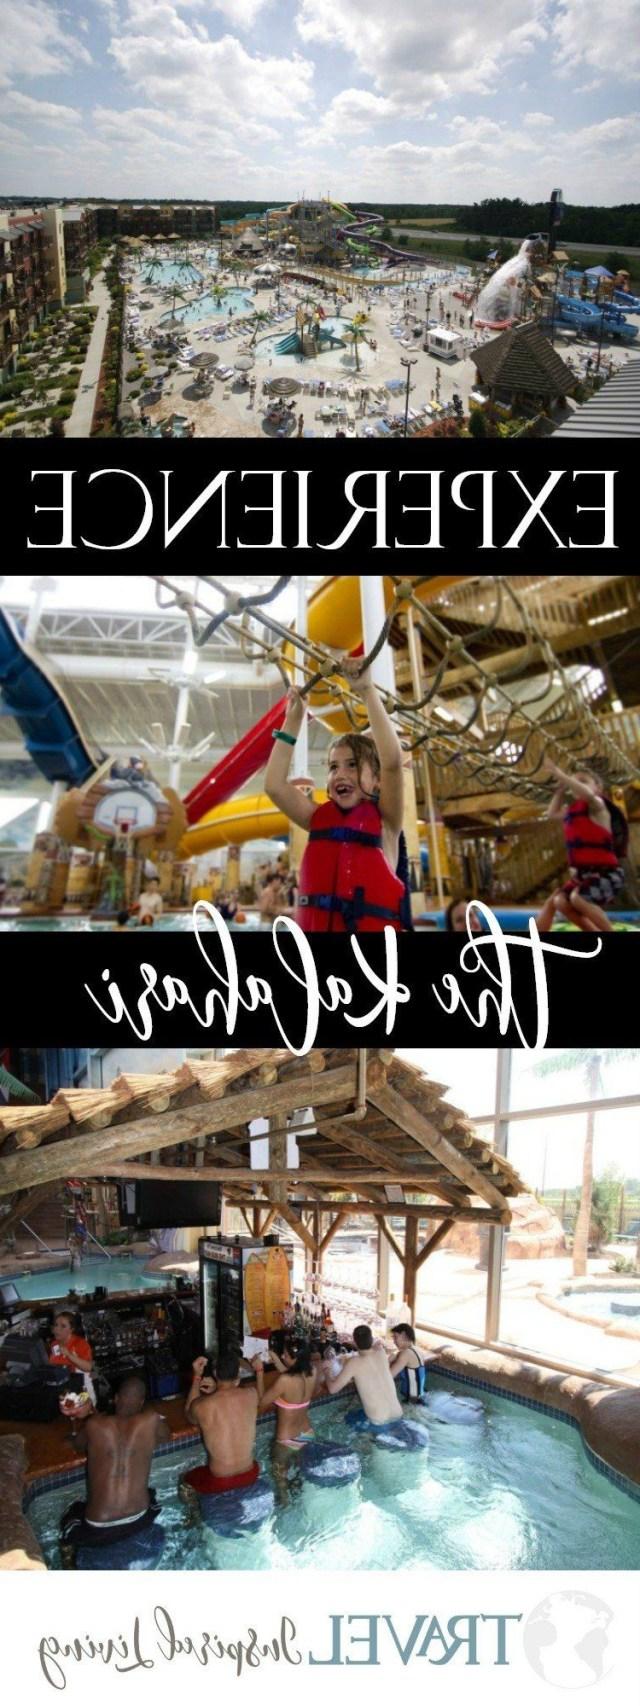 Visit The Kalahari Resorts In Sandusky Ohio For A Fun